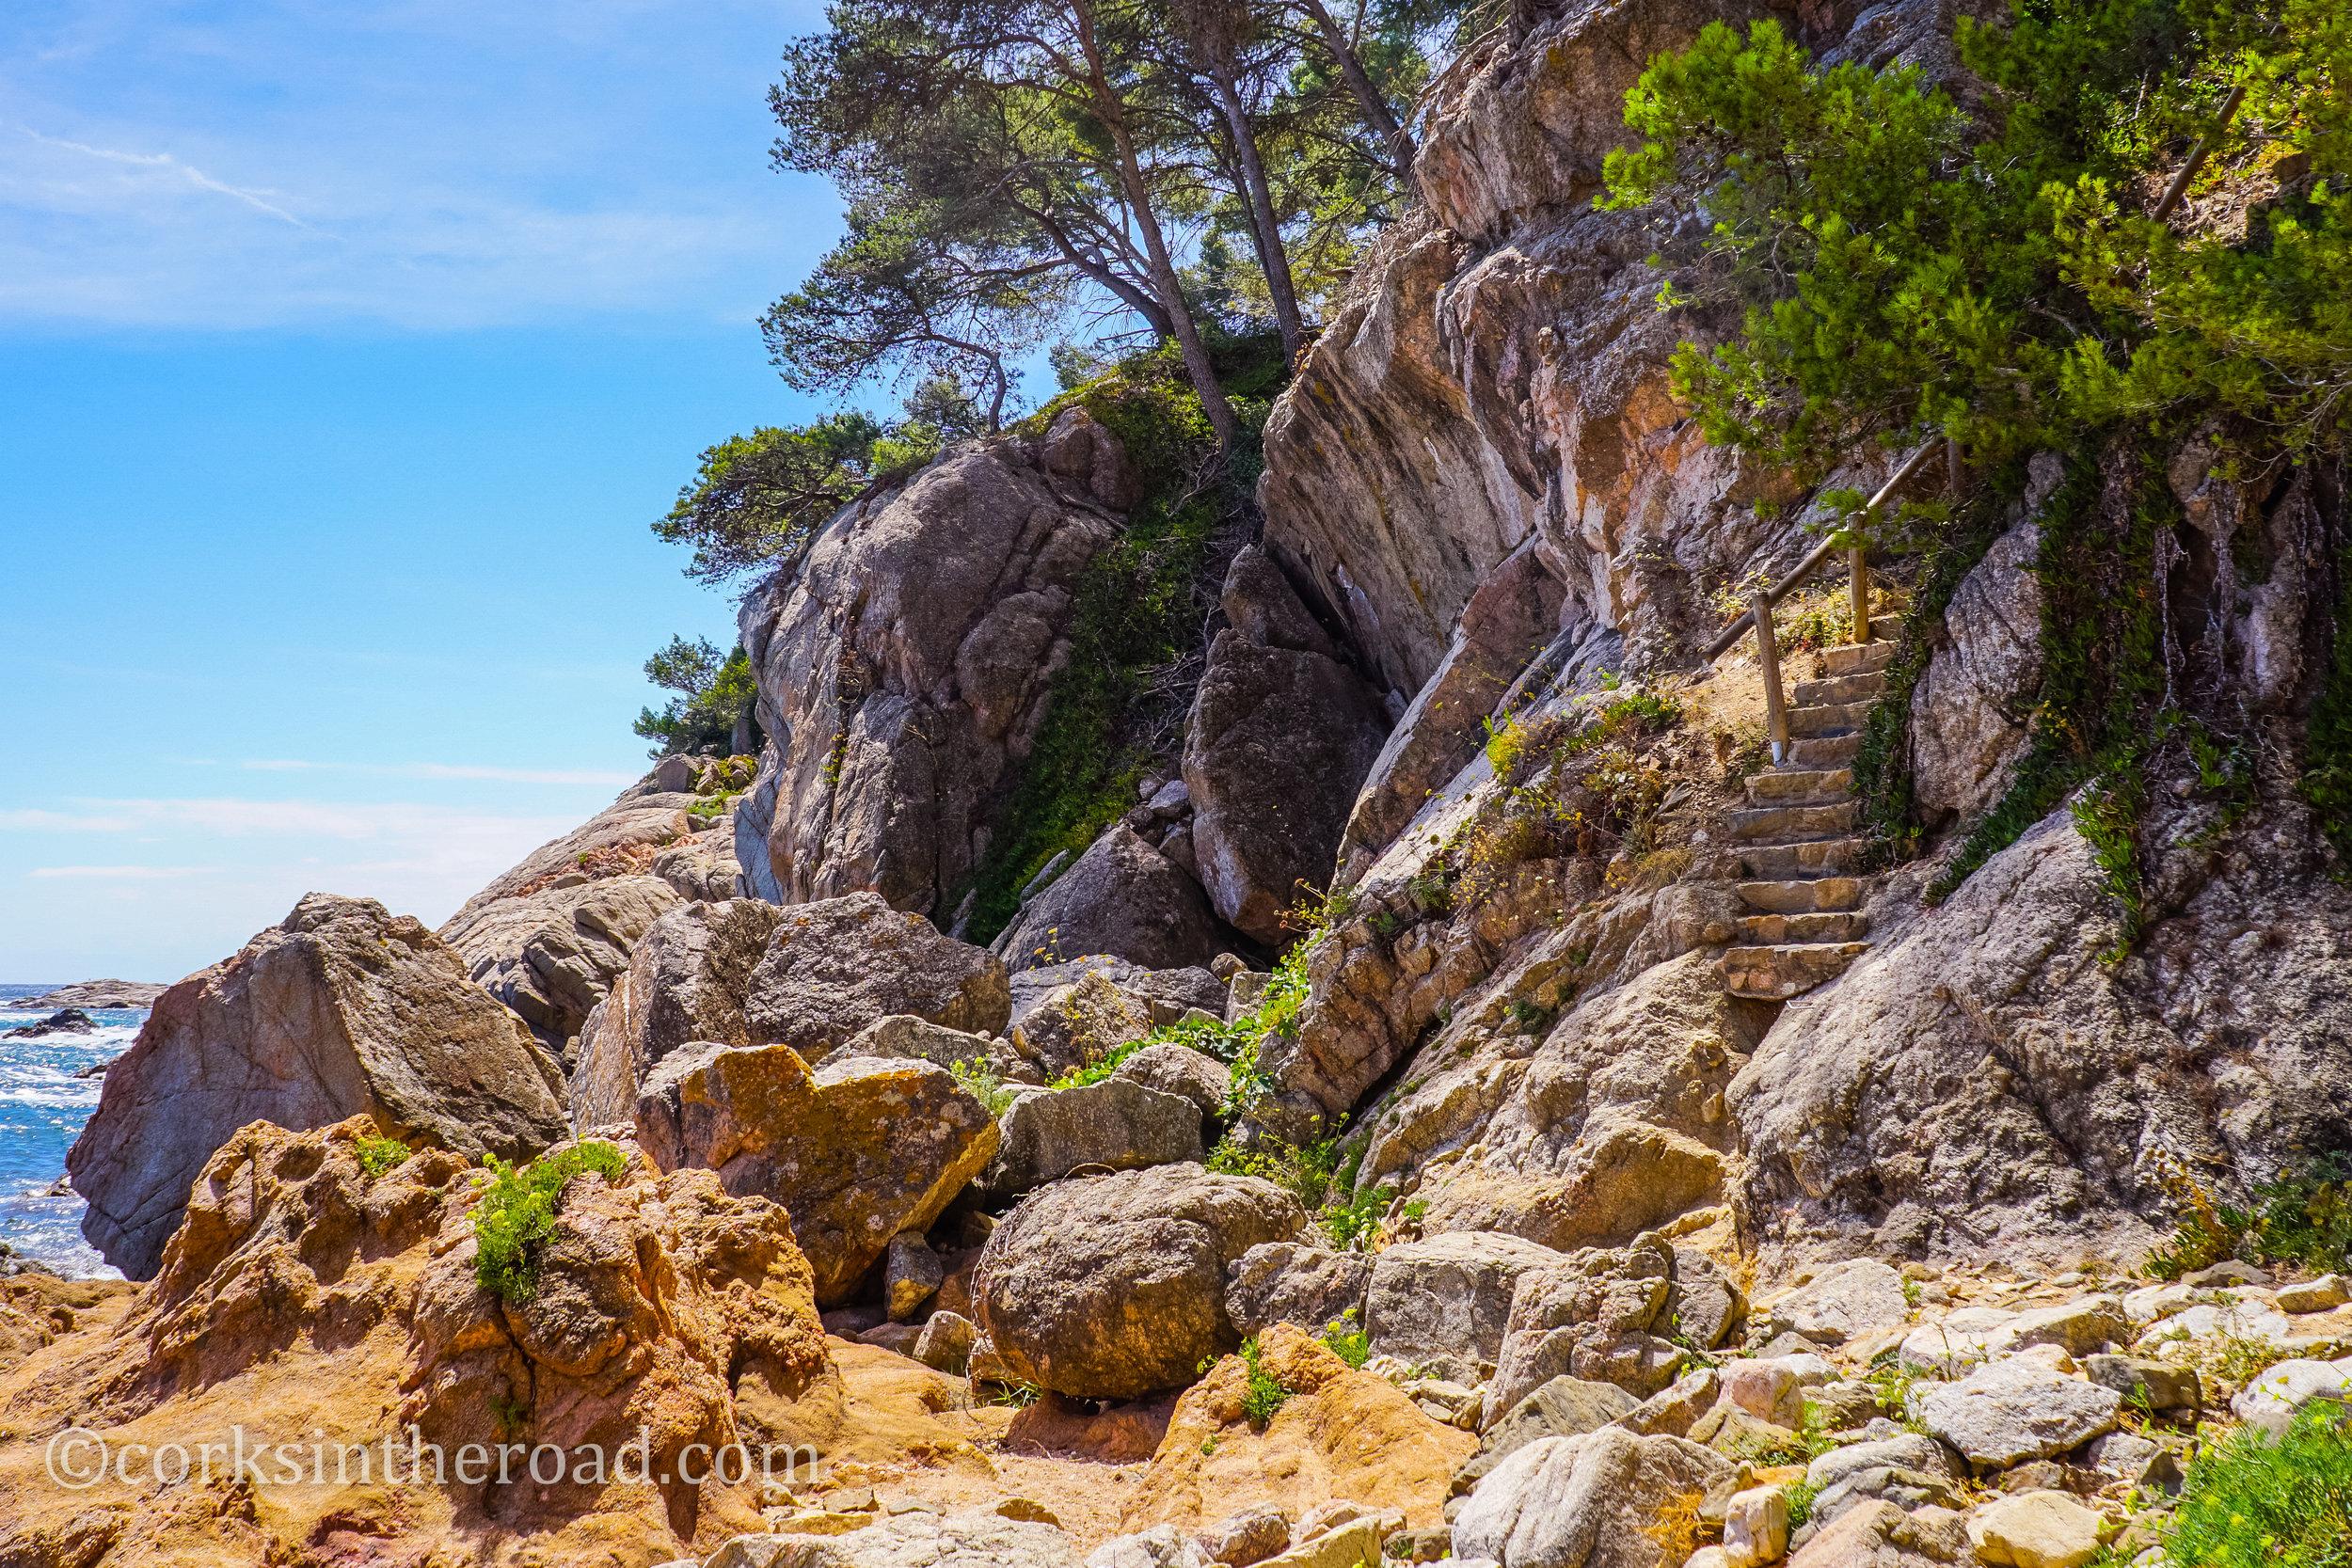 20160810Barcelona, Corksintheroad, Costa Brava, Costa Brava Landscape-38.jpg